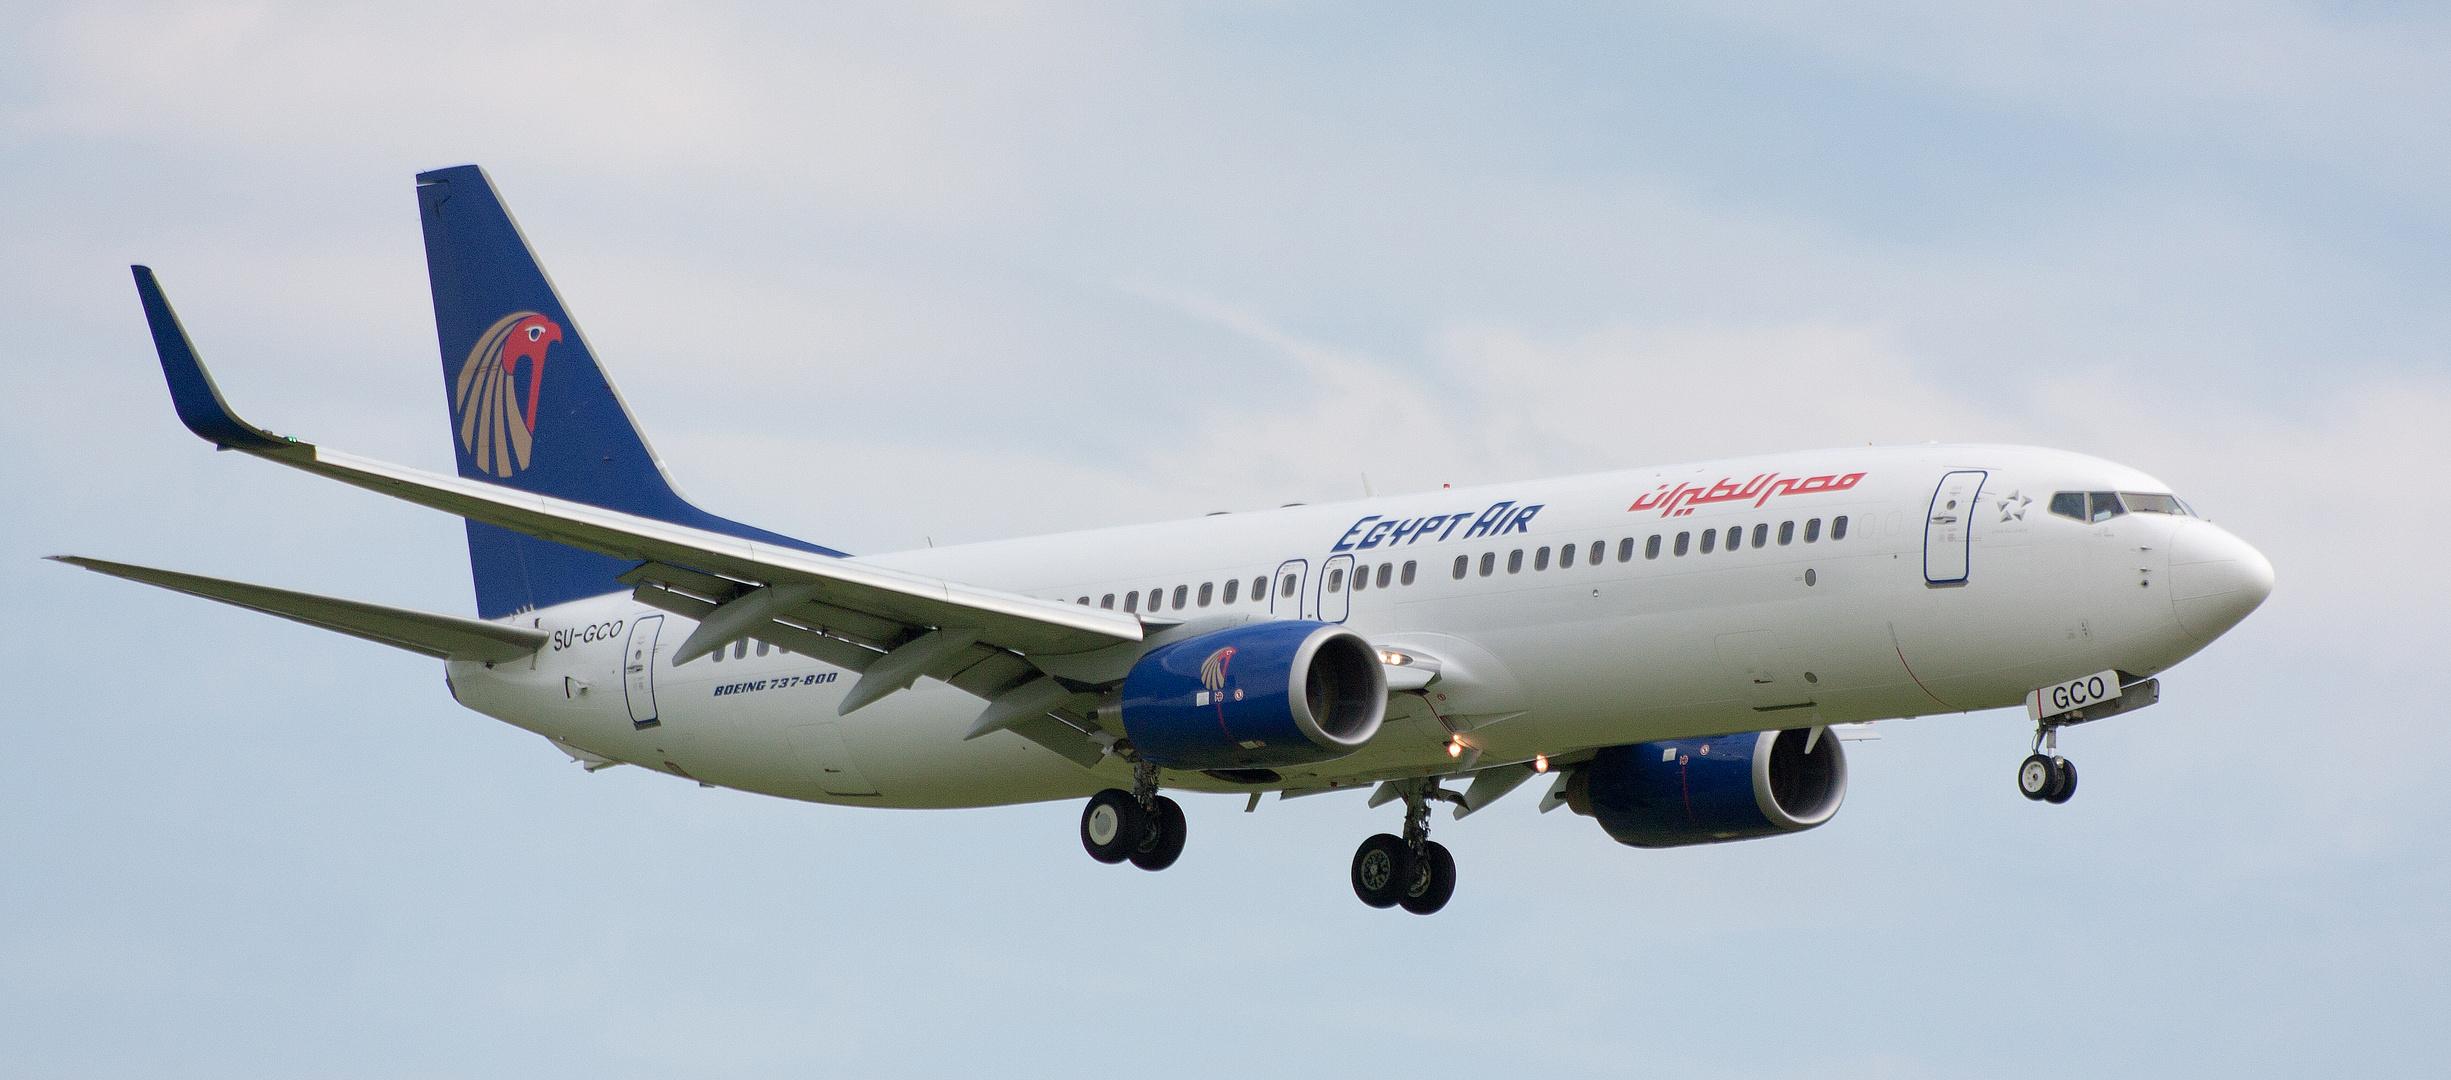 Egypt Air im Anflug auf DUS